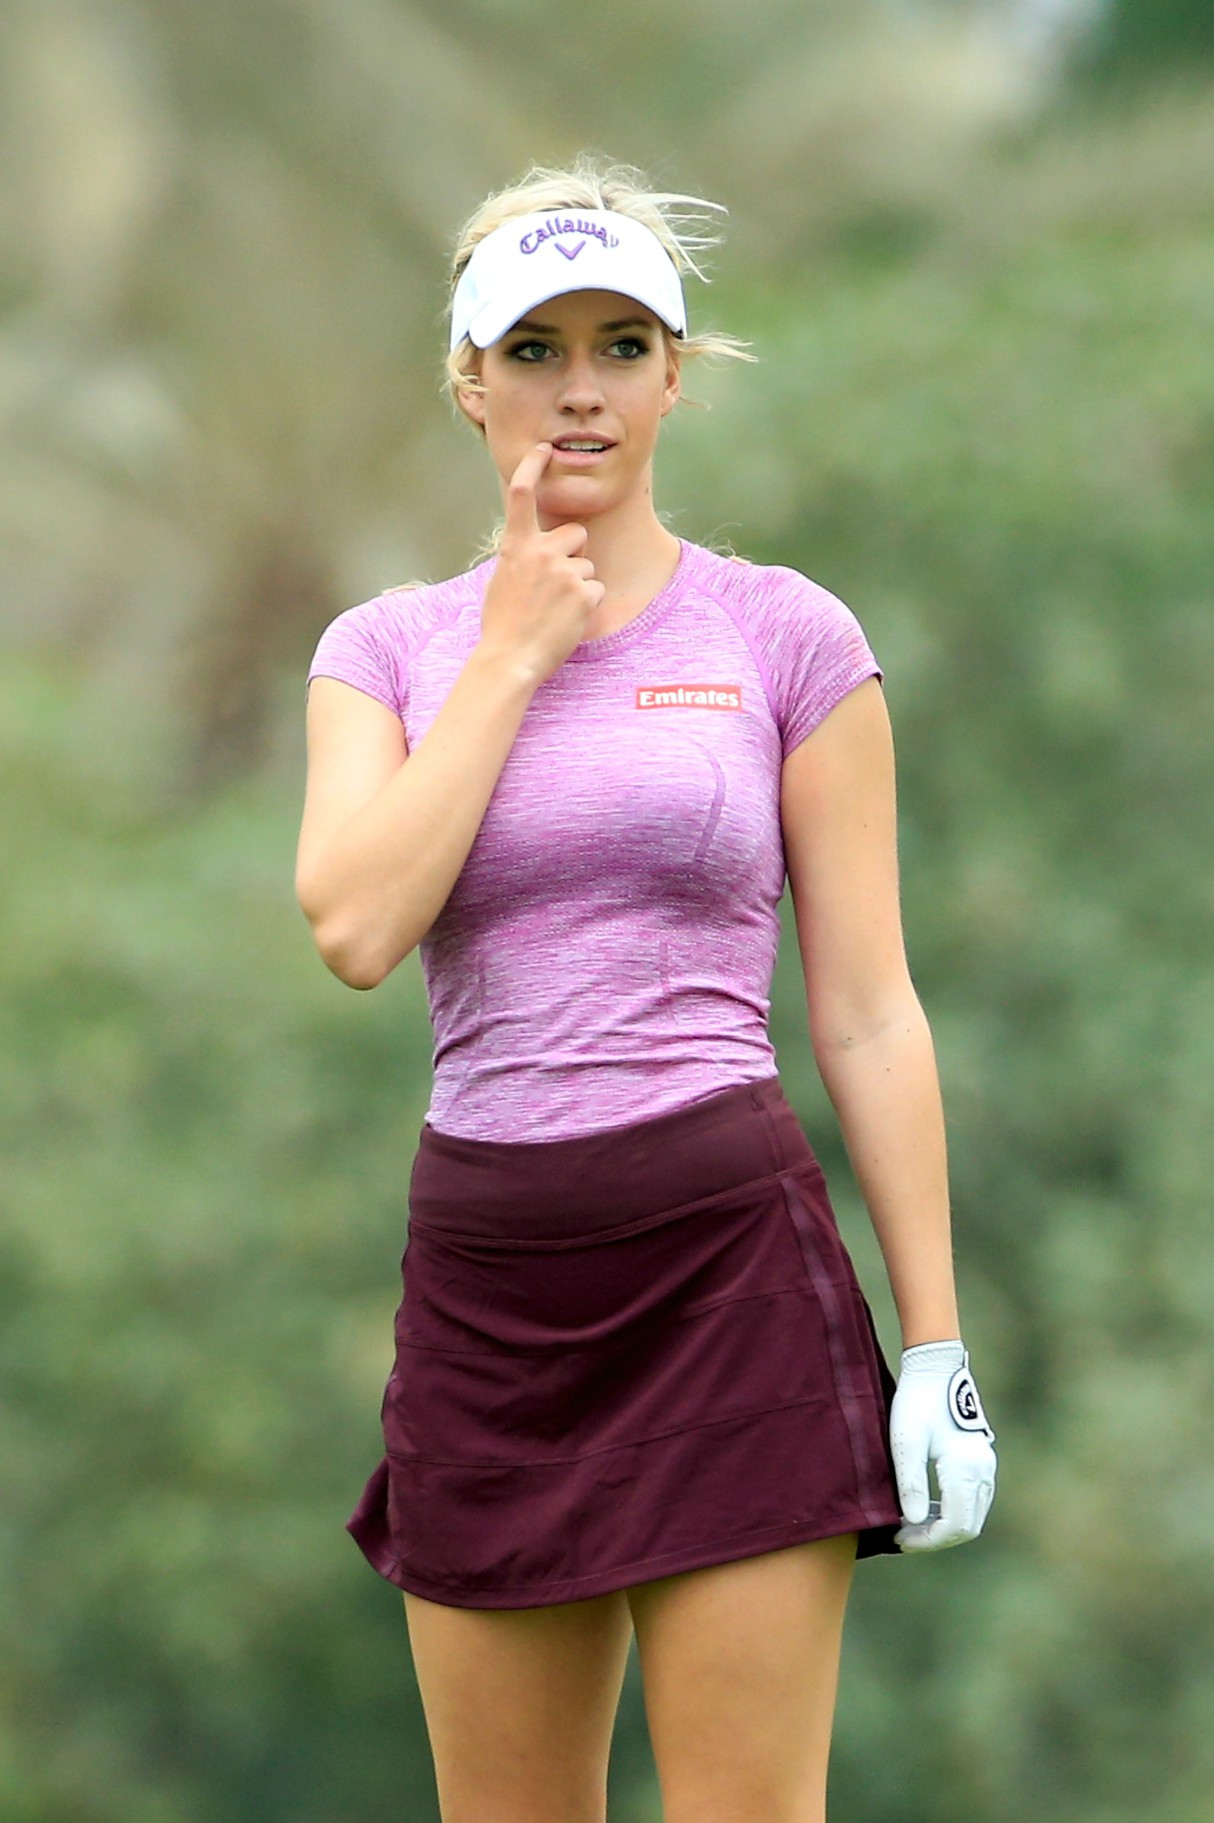 hottest-female-golfers-paige-spiranac-2